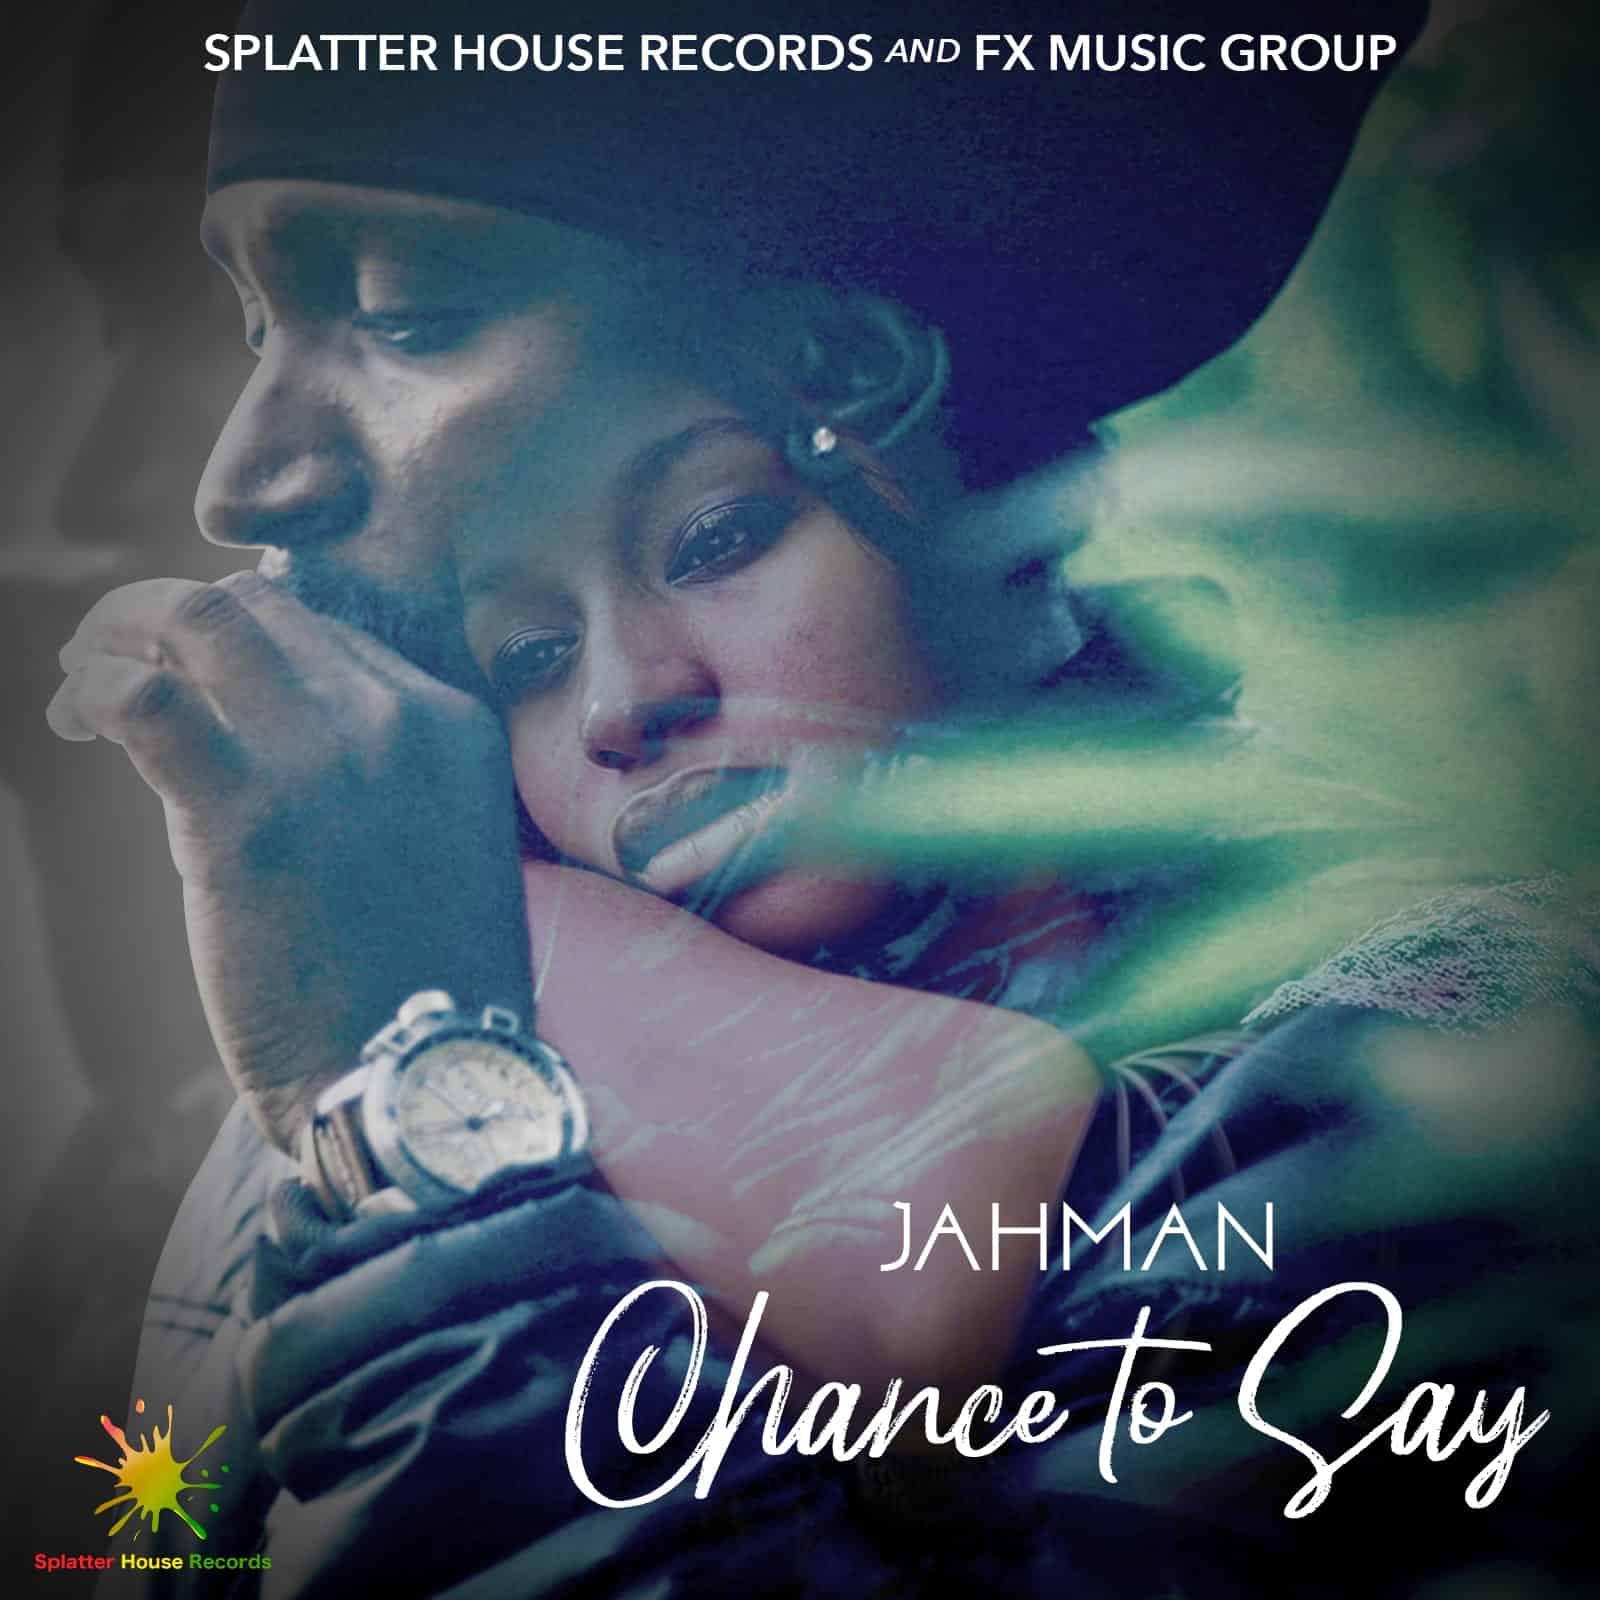 Jahman - Chance to Say - Prod By JonFX - Splatter House Records